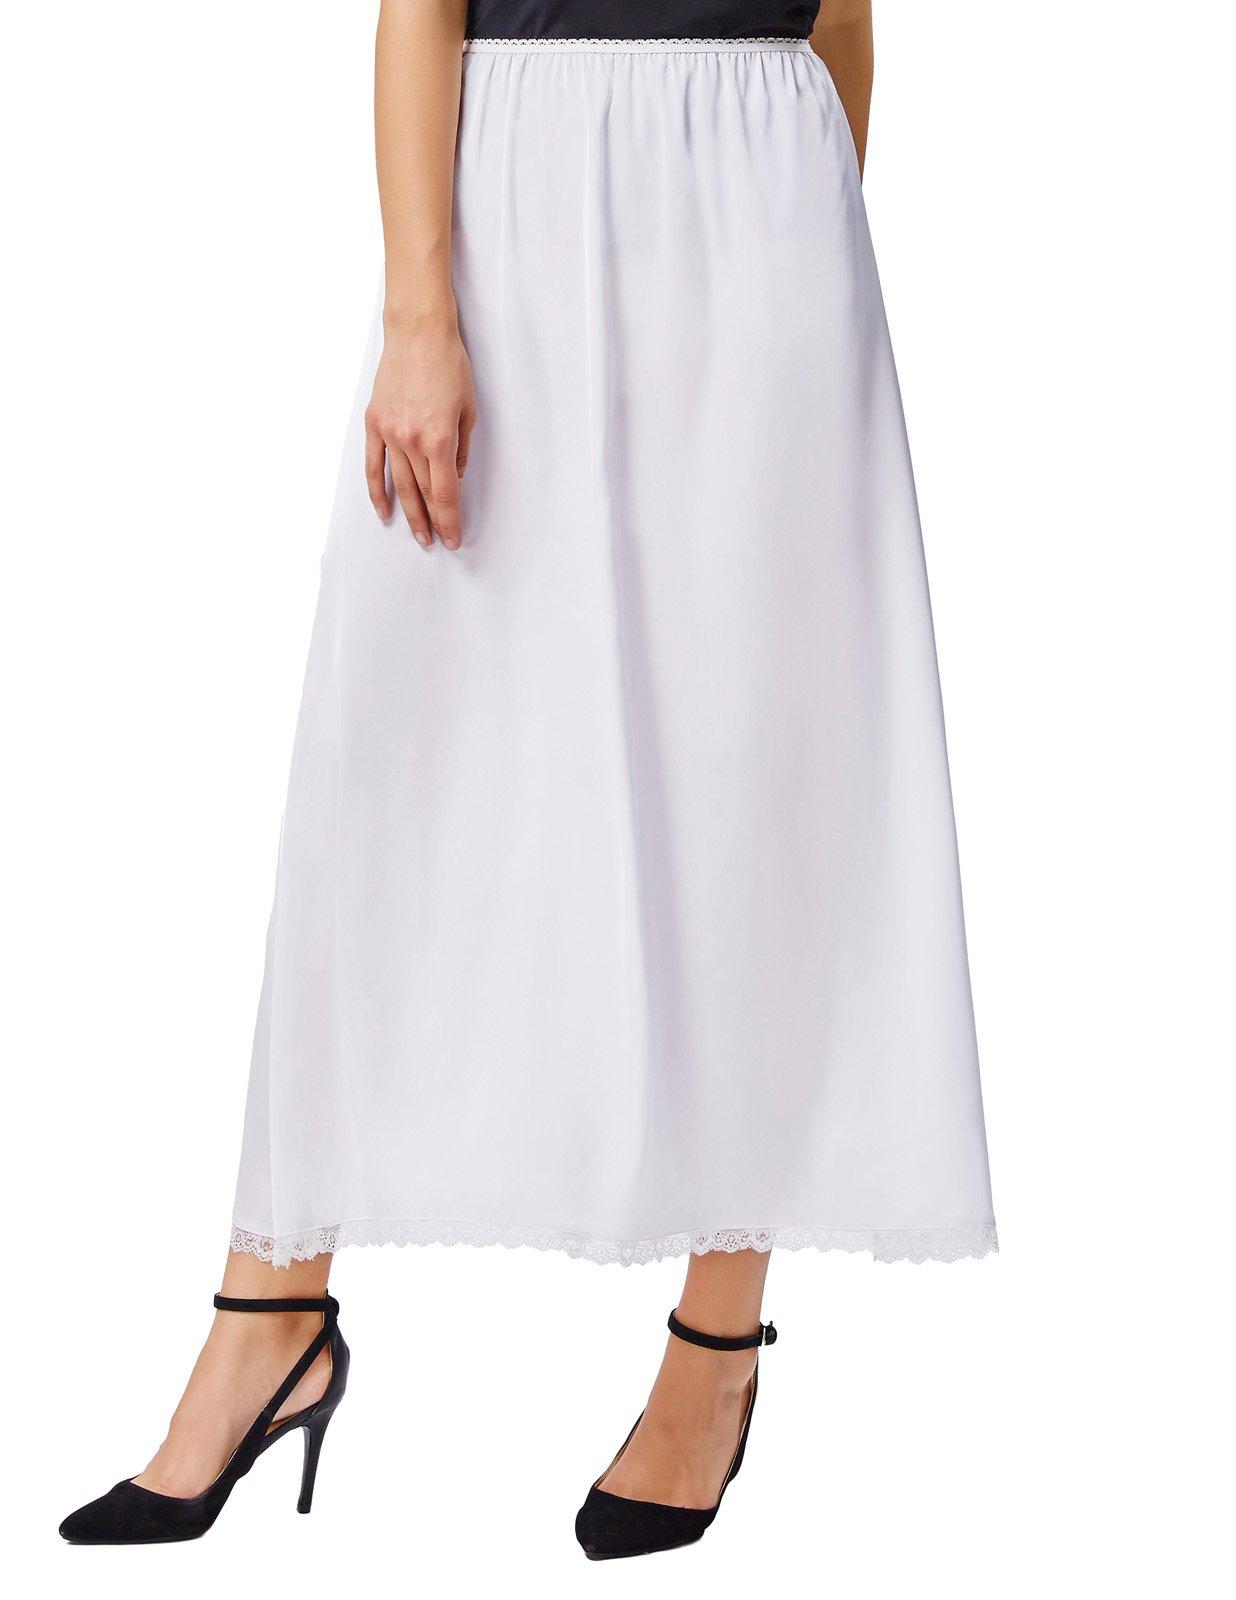 Kate Kasinwhite Comfortable Half Skirt For Maxi Dress Wiggle Night